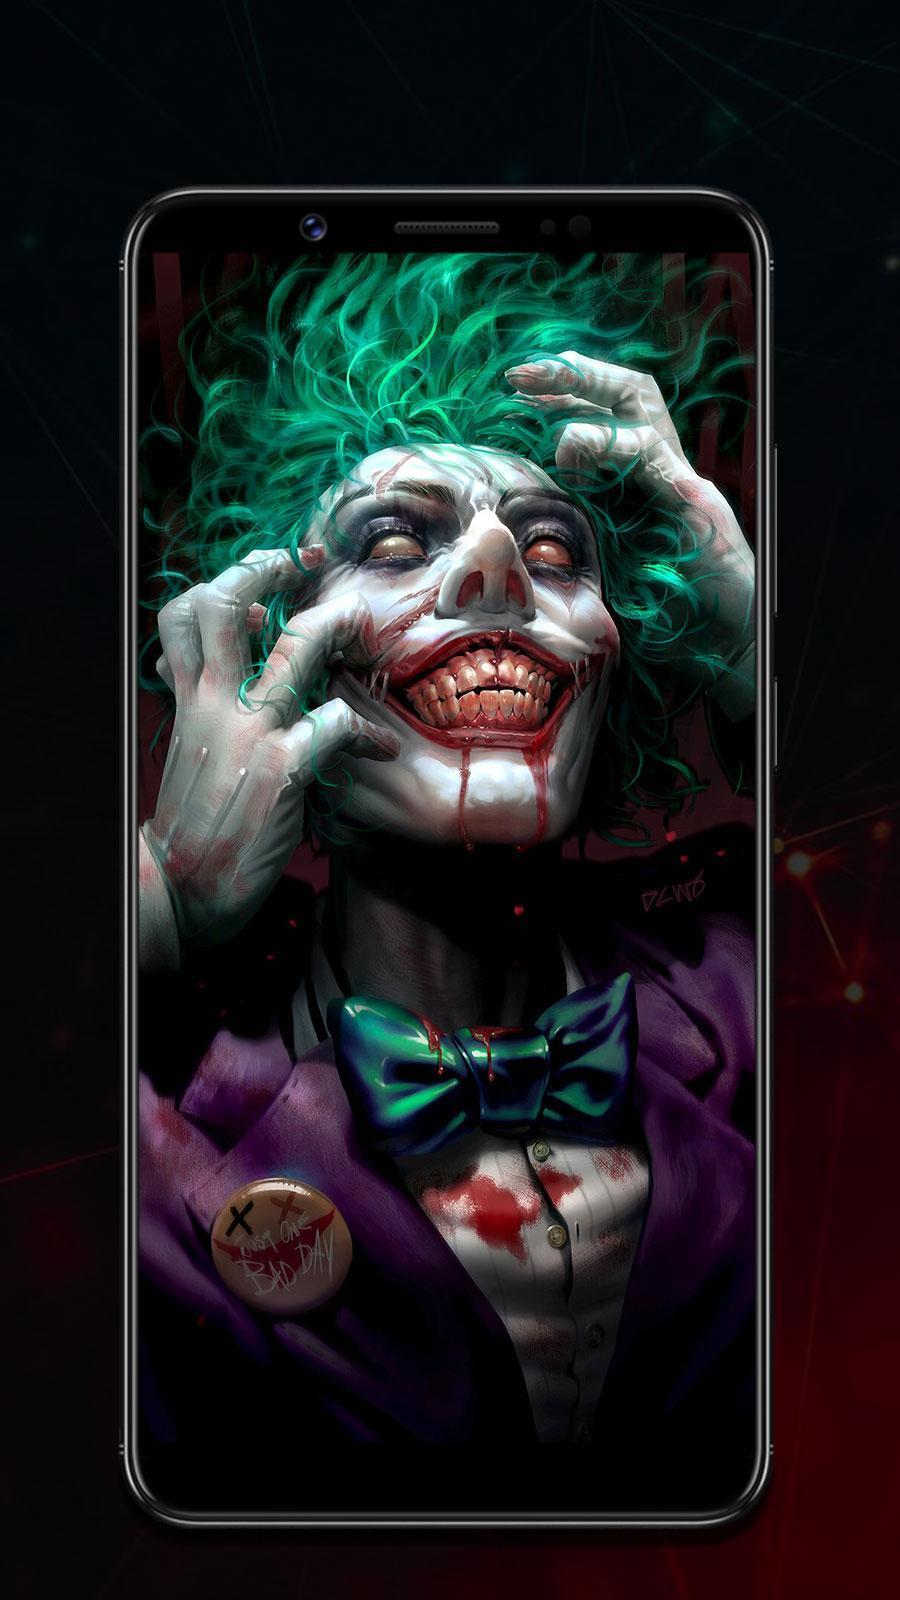 Joker Wallpaper Hd I 4k Background For Android Apk Download